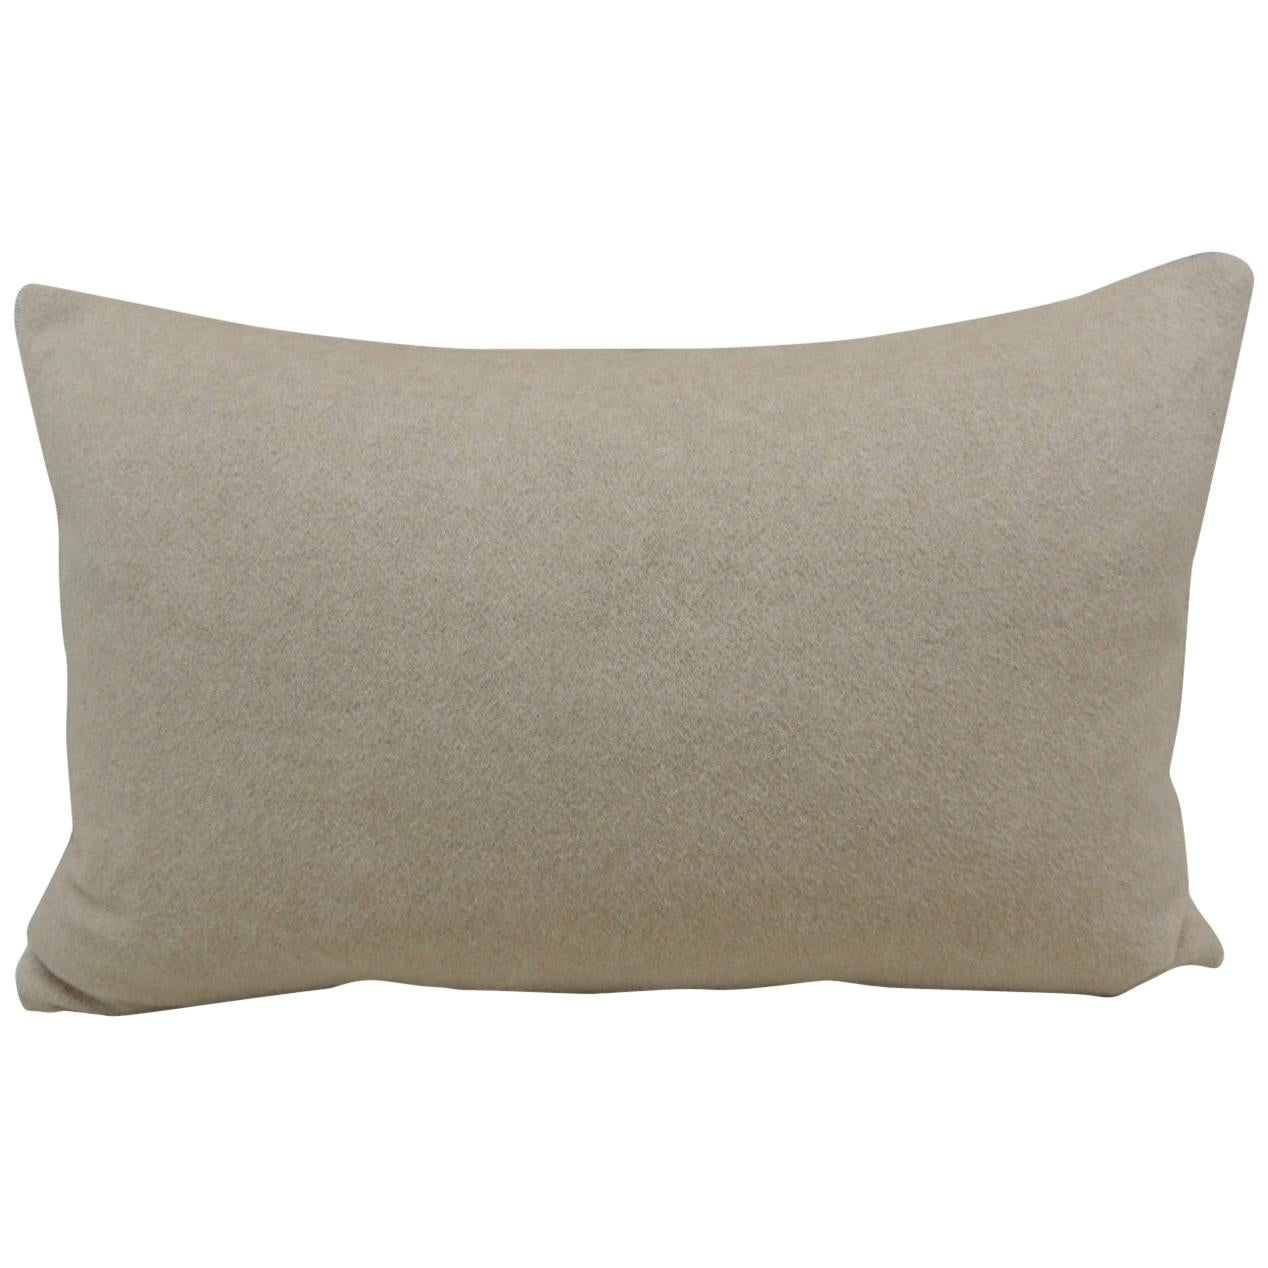 Beige Tone-on-tone Loro Piana Cashmere Decorative Lumbar Pillow